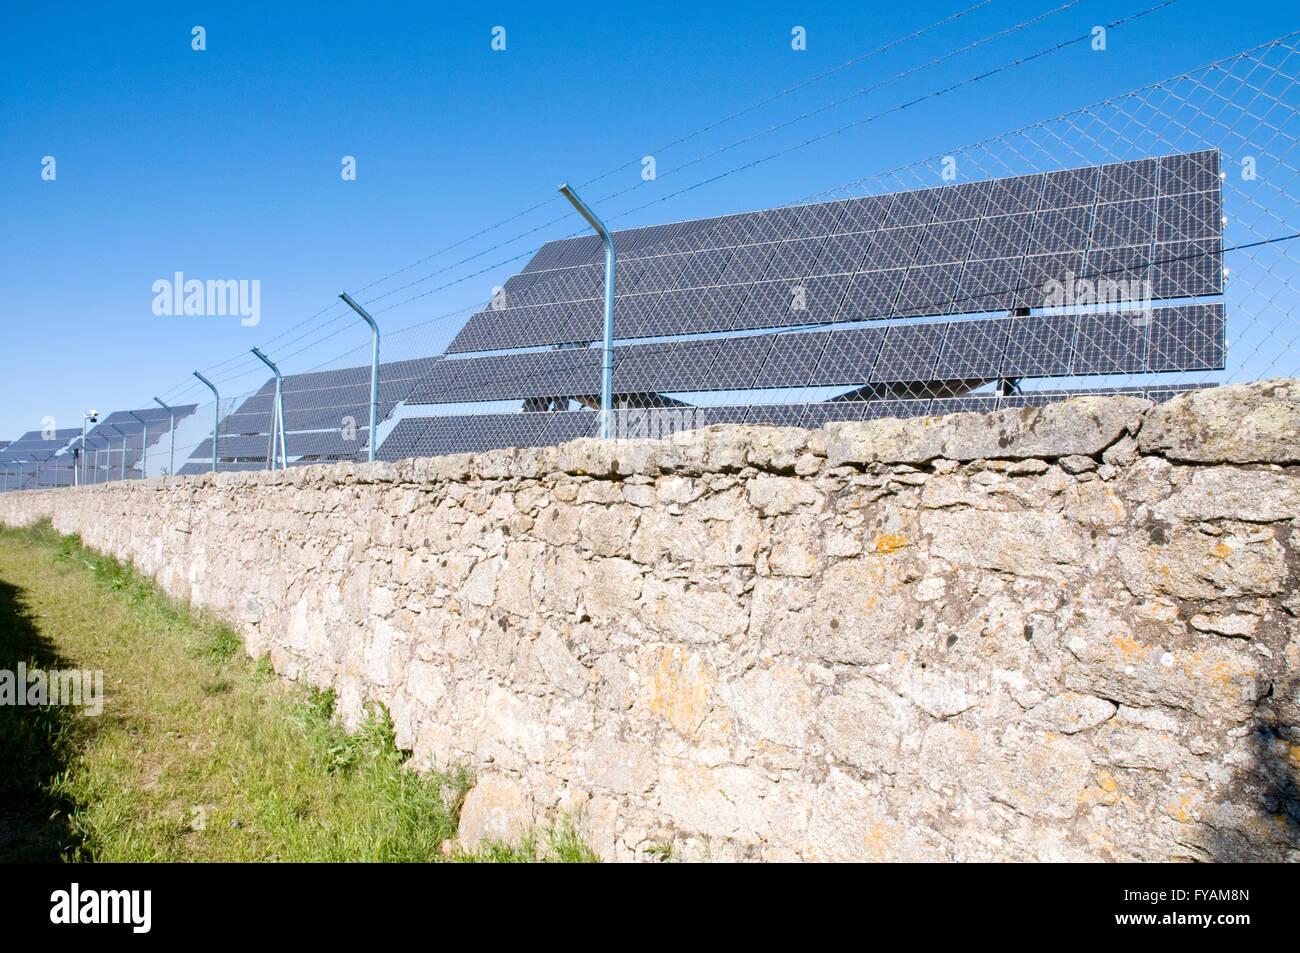 Solar panels behind wire fence. Solar energy production plant. Toledo province. Castile La Mancha. Spain. - Stock Image